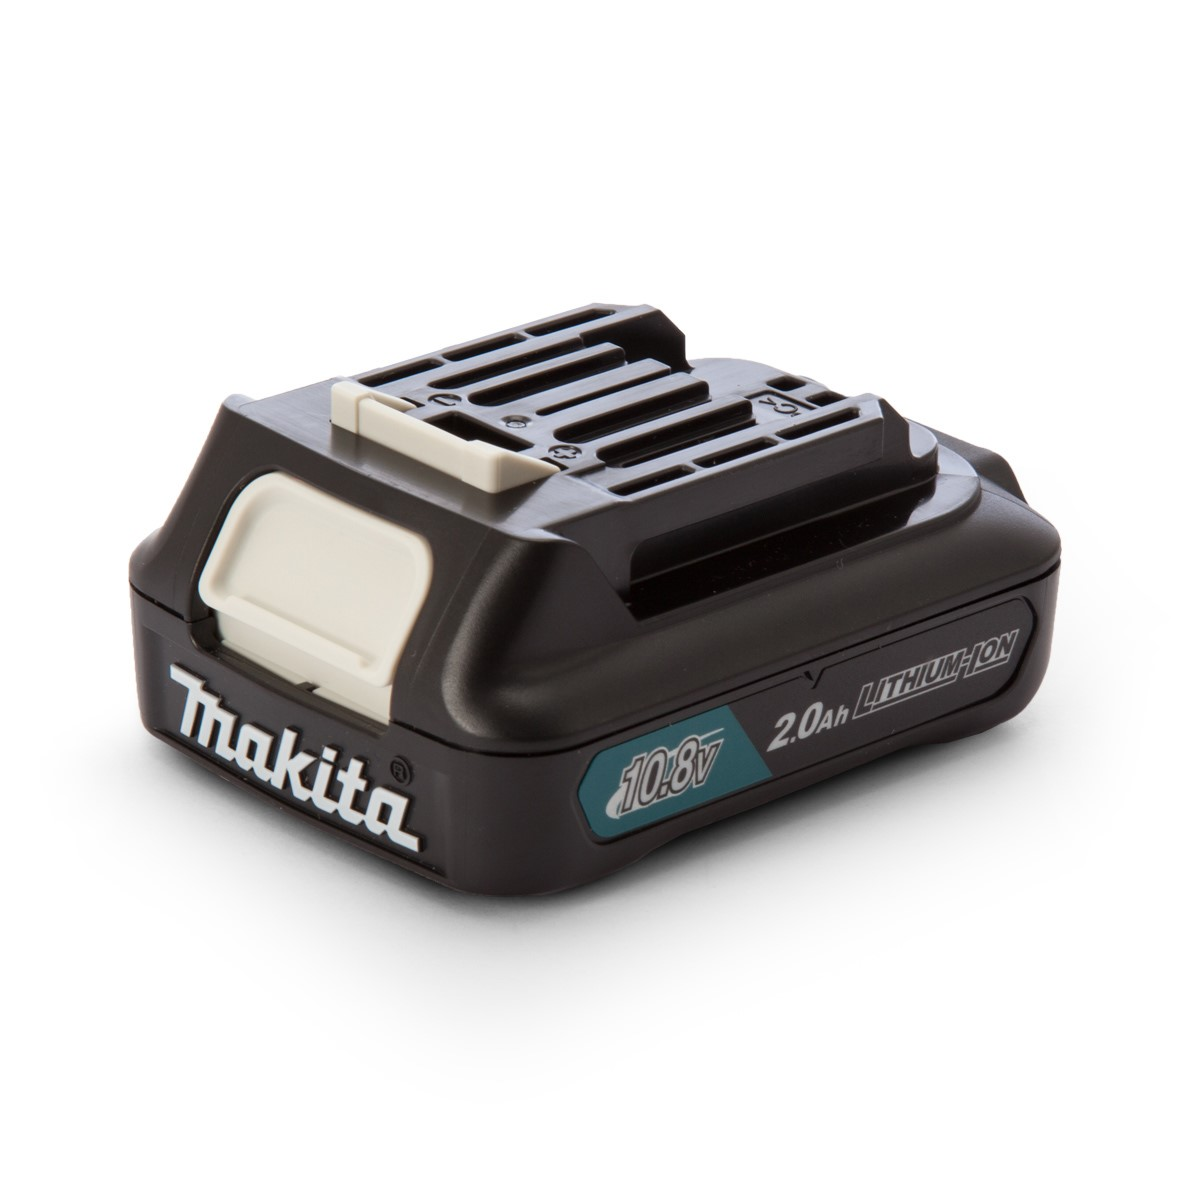 Baterie Makita Li-ion 10,8V aku: 2,0Ah